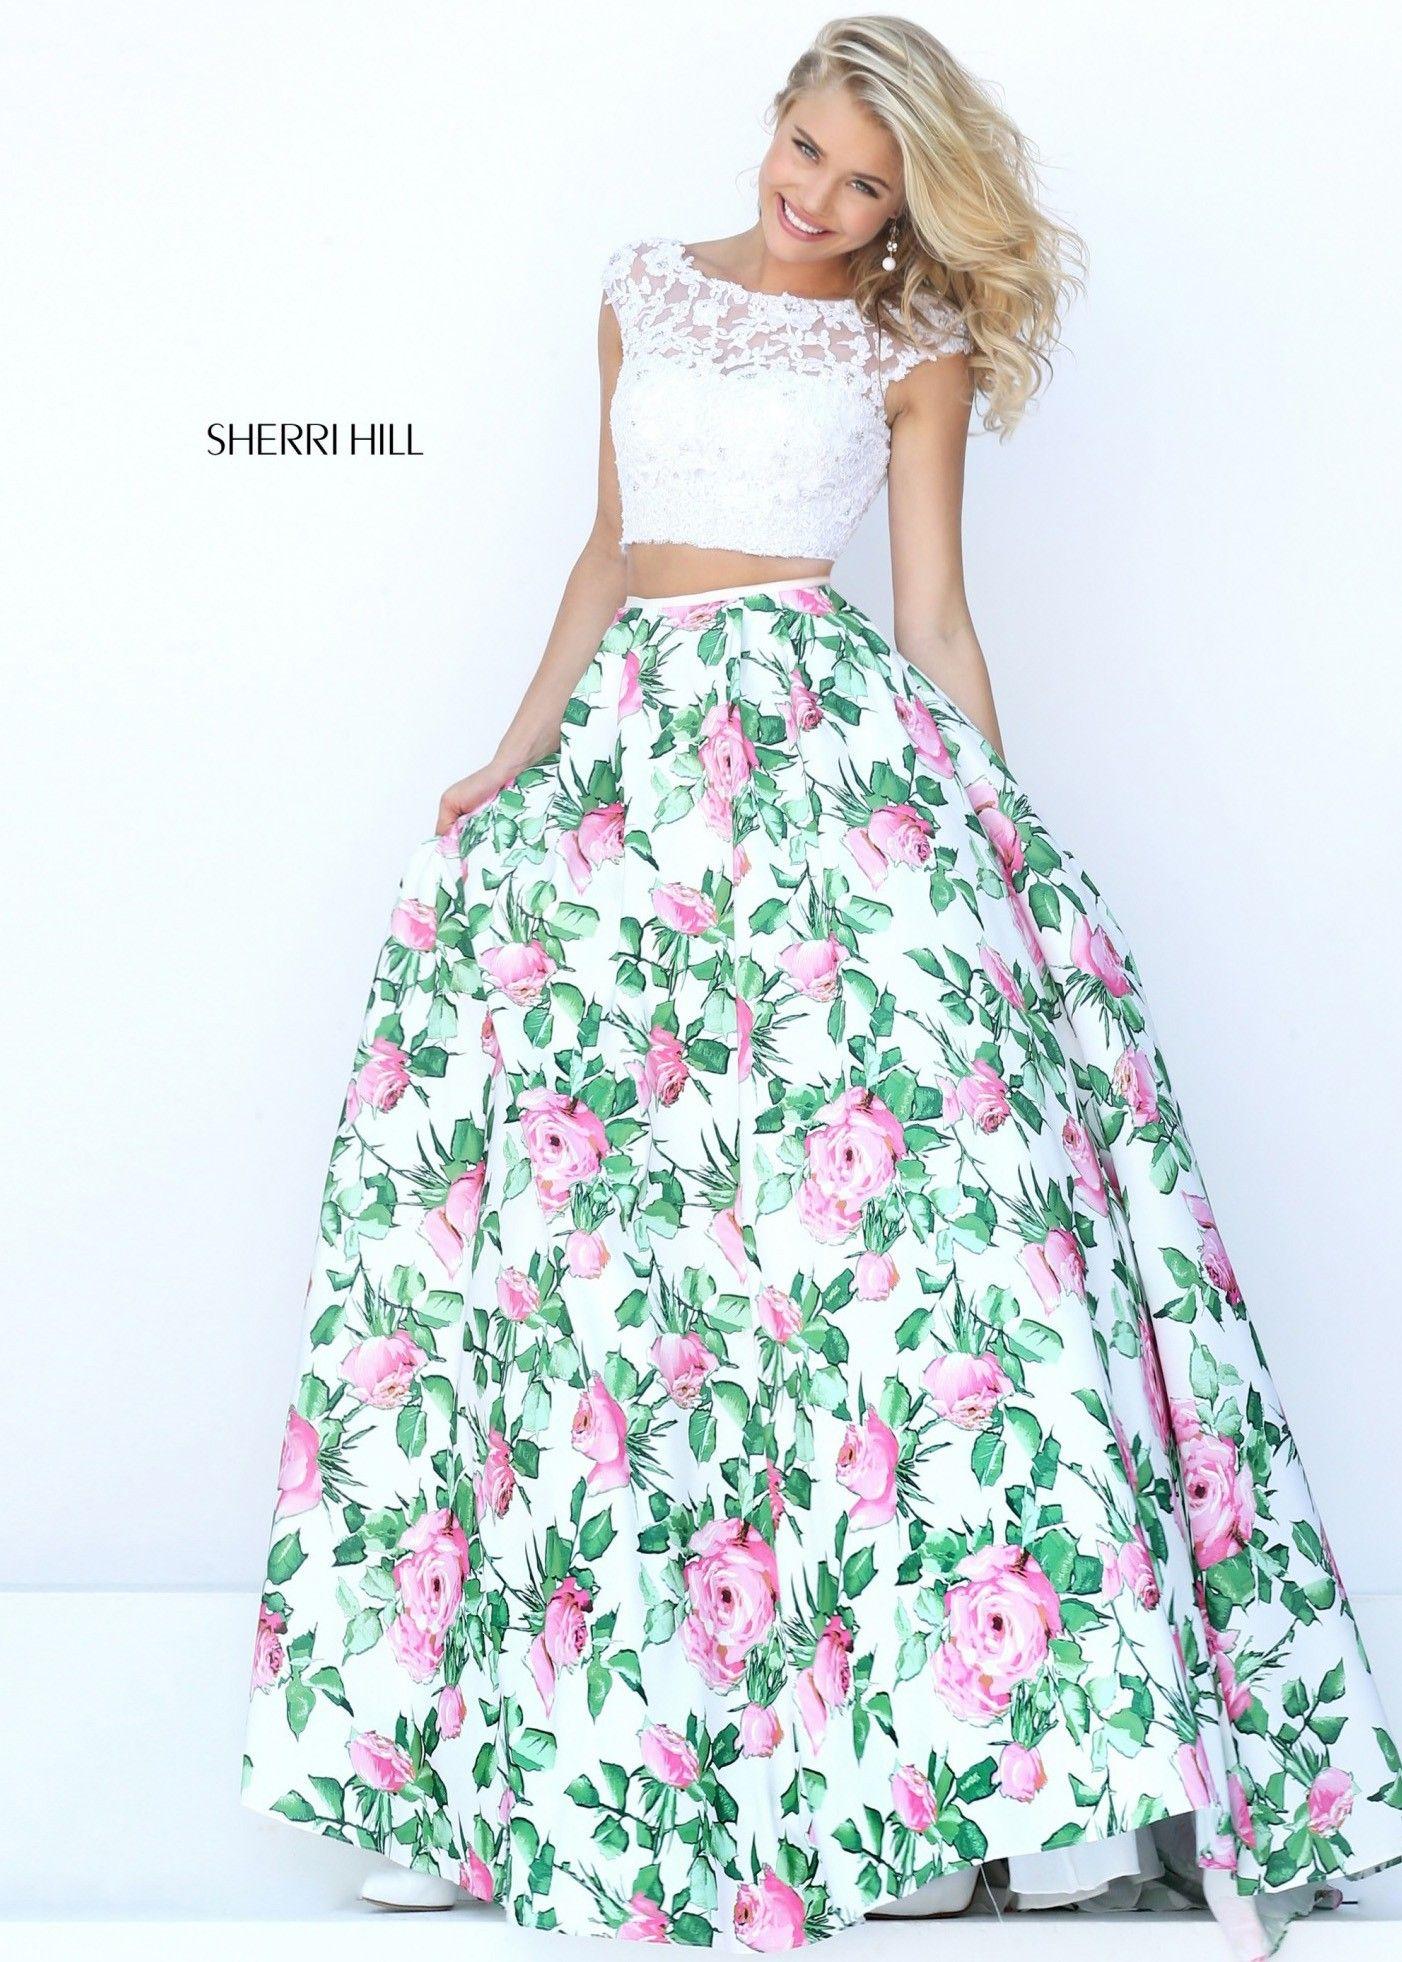 Sherri Hill 50492 Floral Print 2 Piece Ball Gown